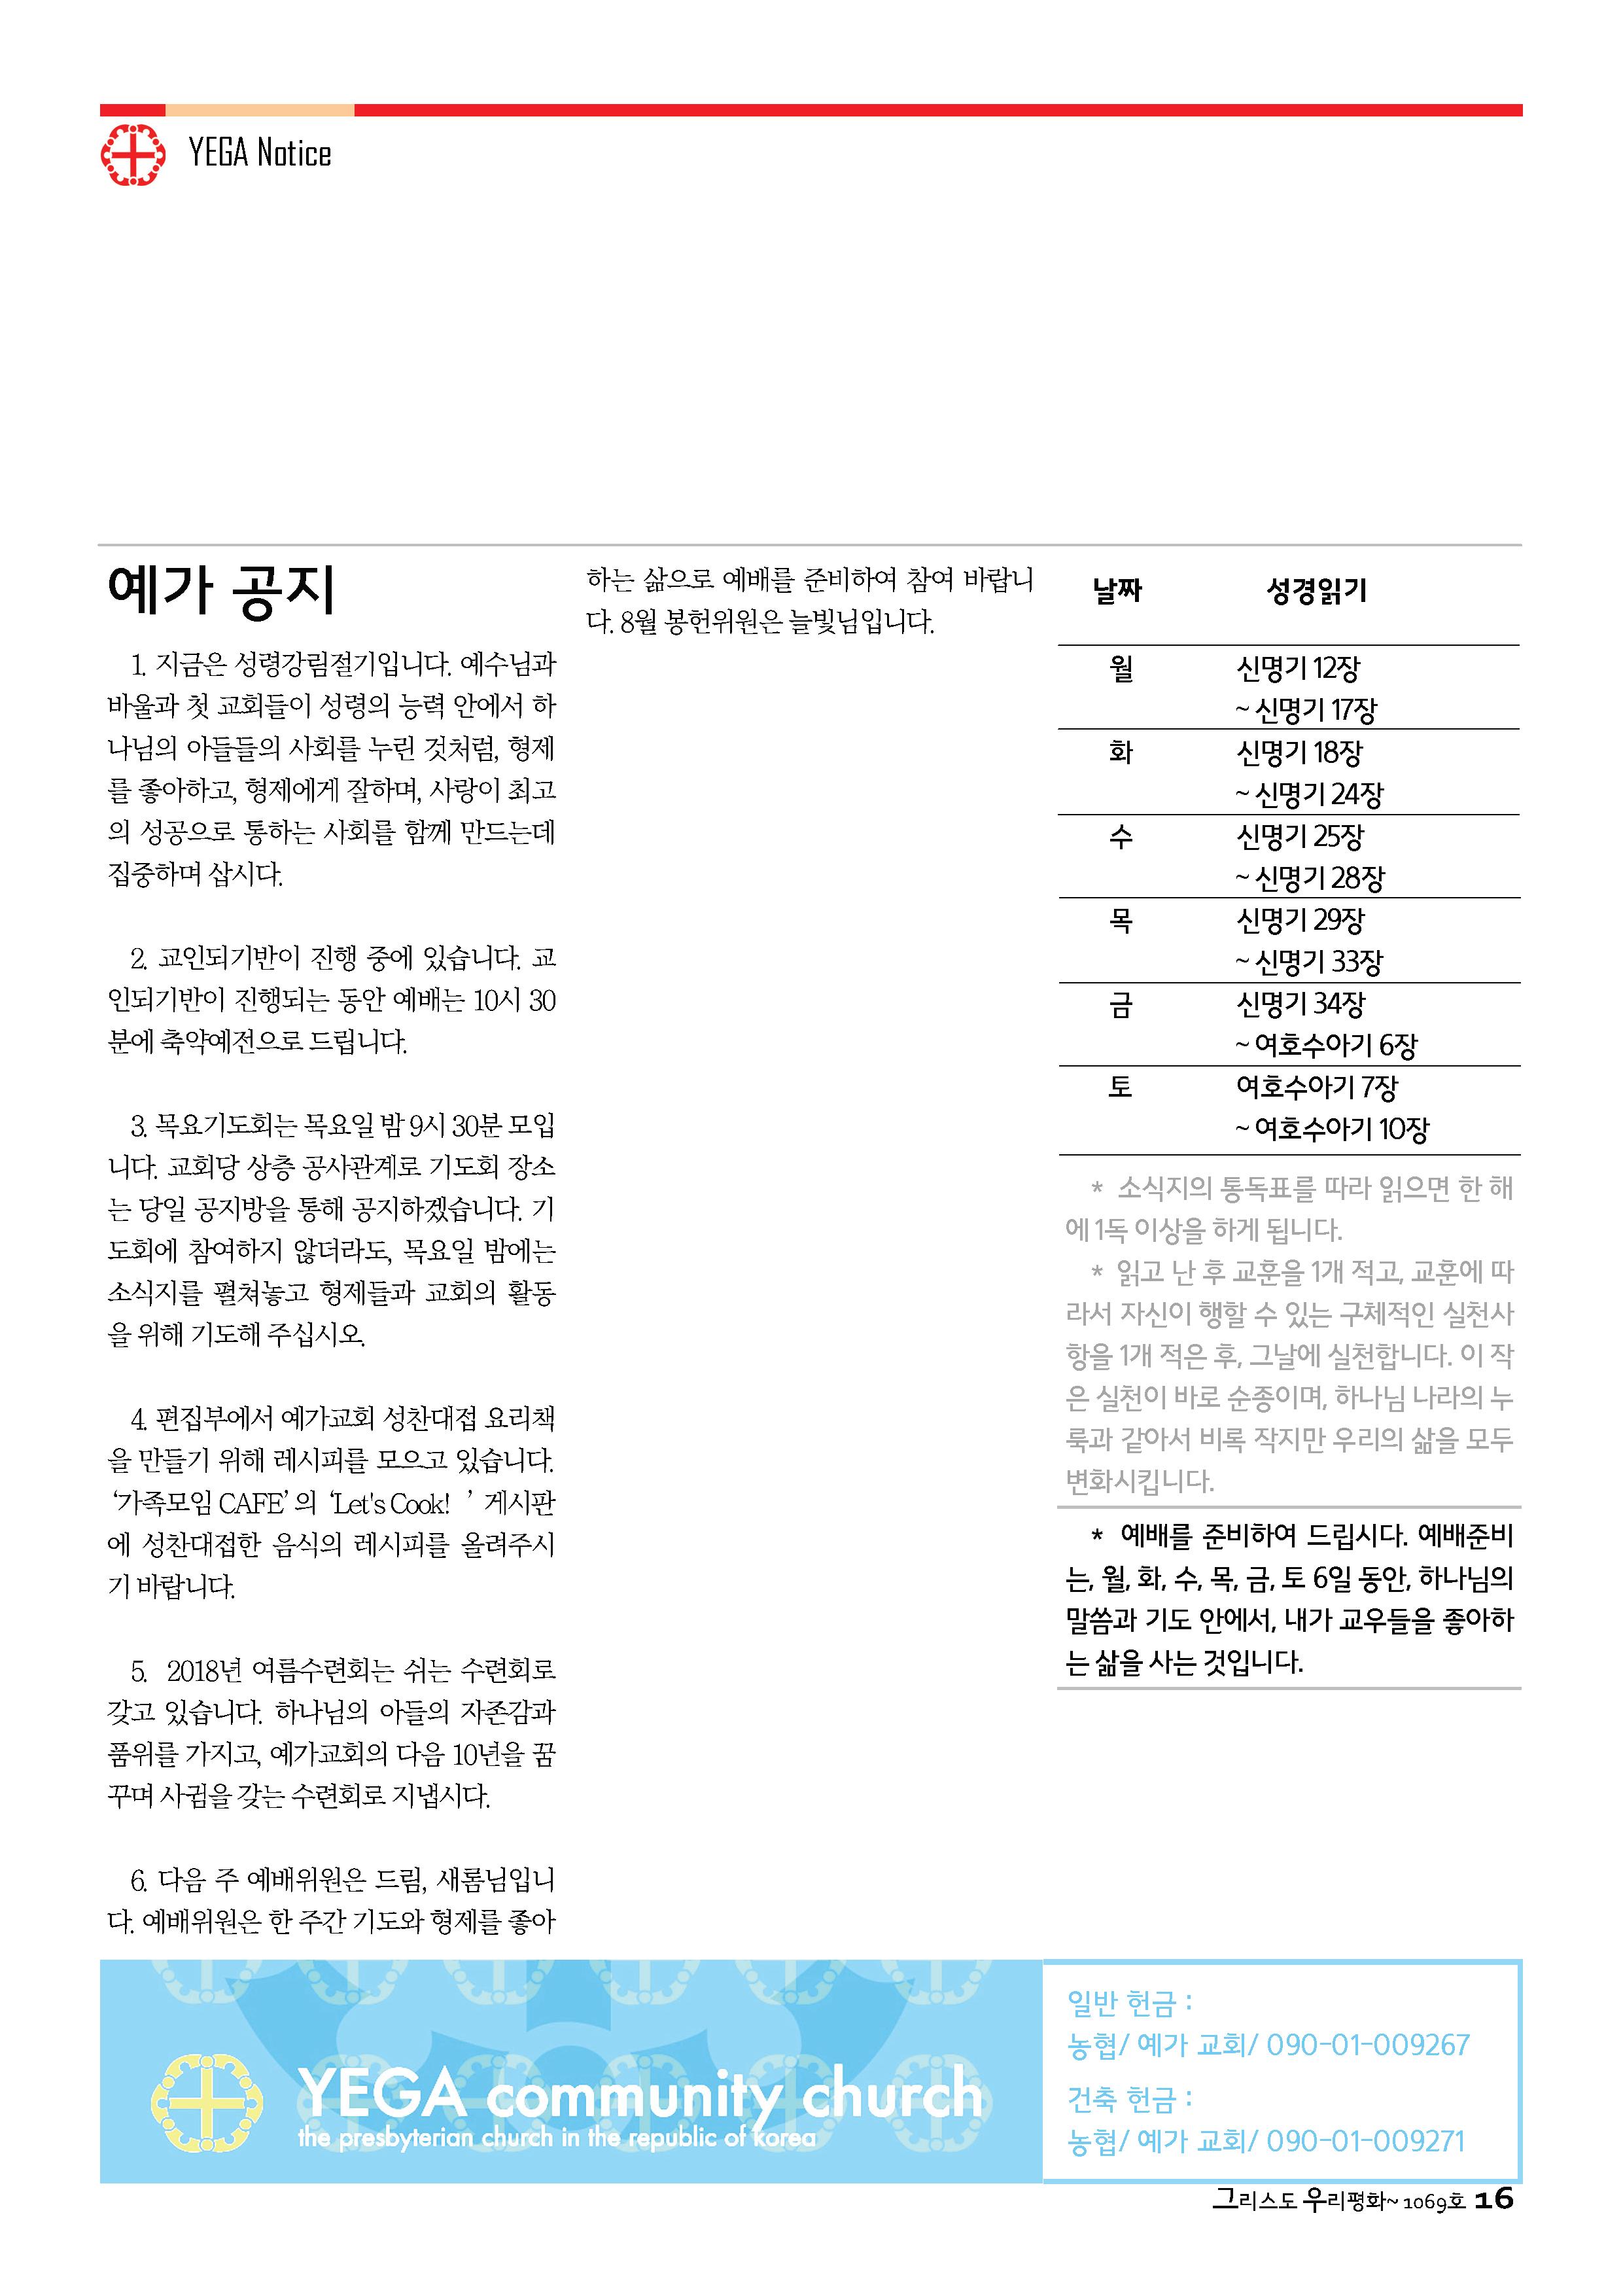 18sdjb0812_합본_페이지_16.png